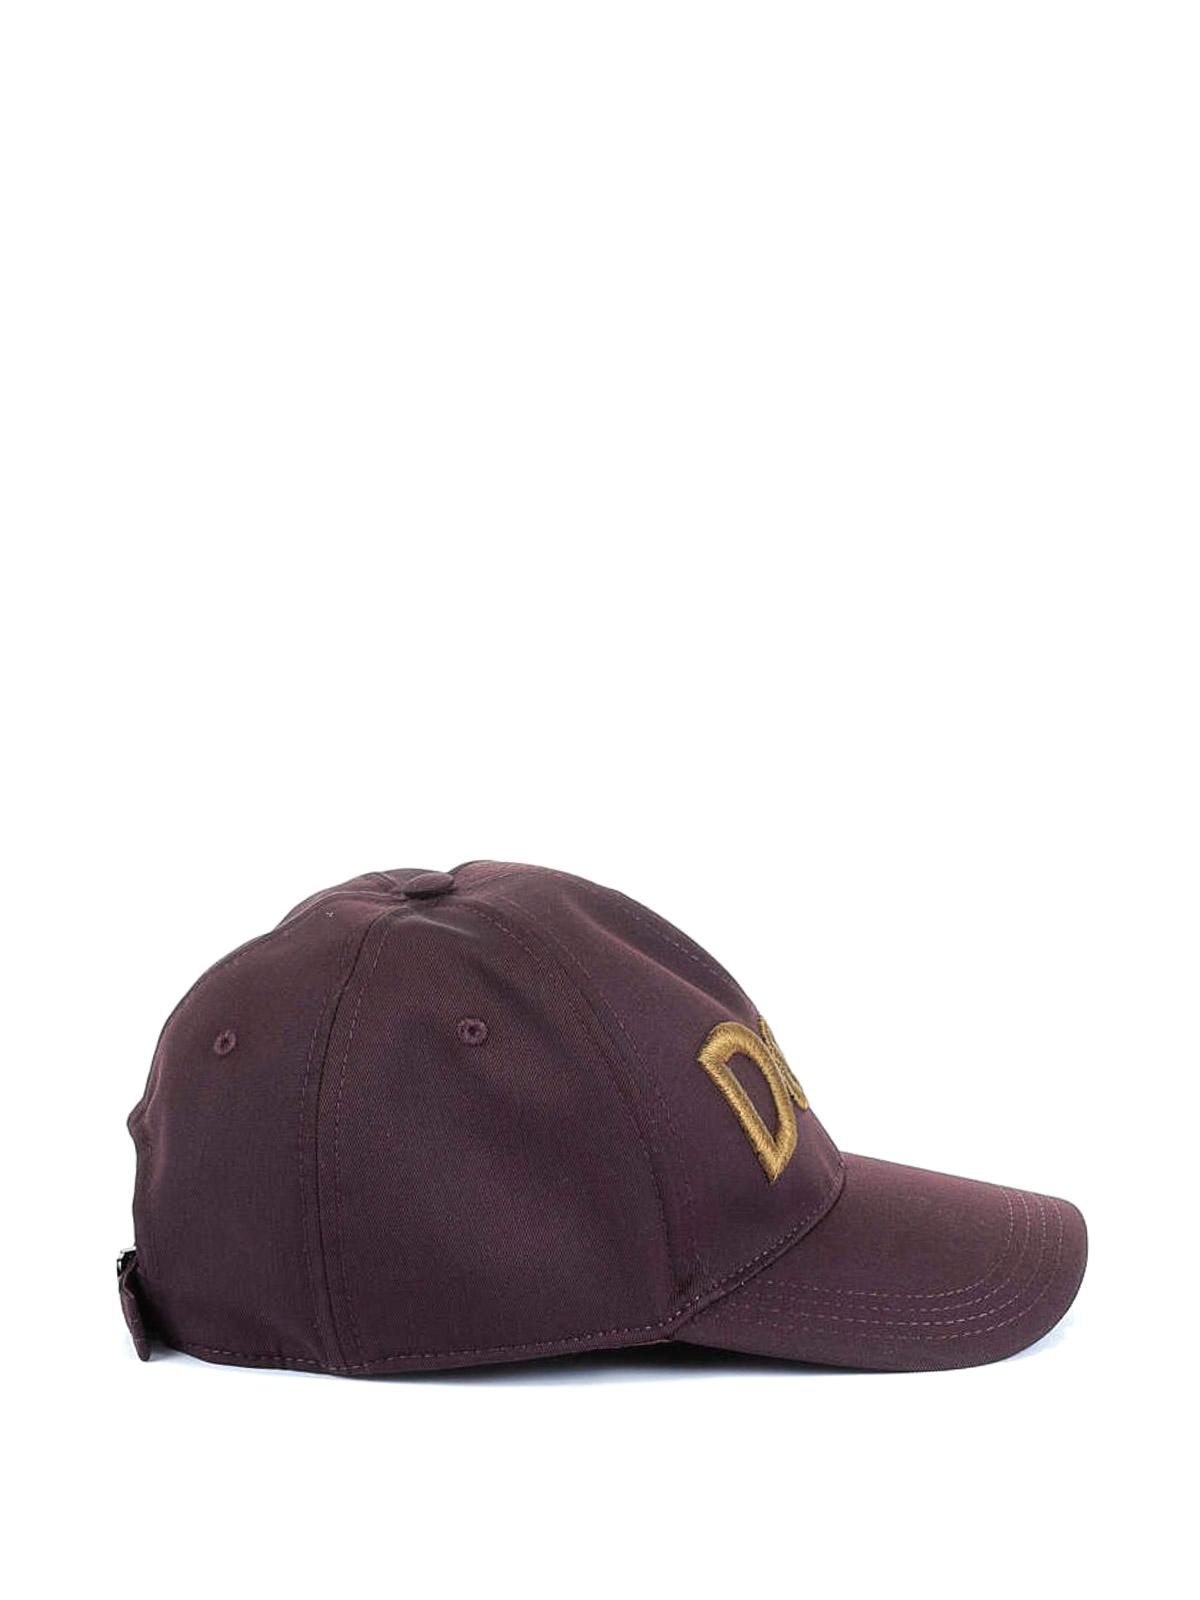 263fa02cf Dolce & Gabbana - D&G embroidery baseball cap - hats & caps ...